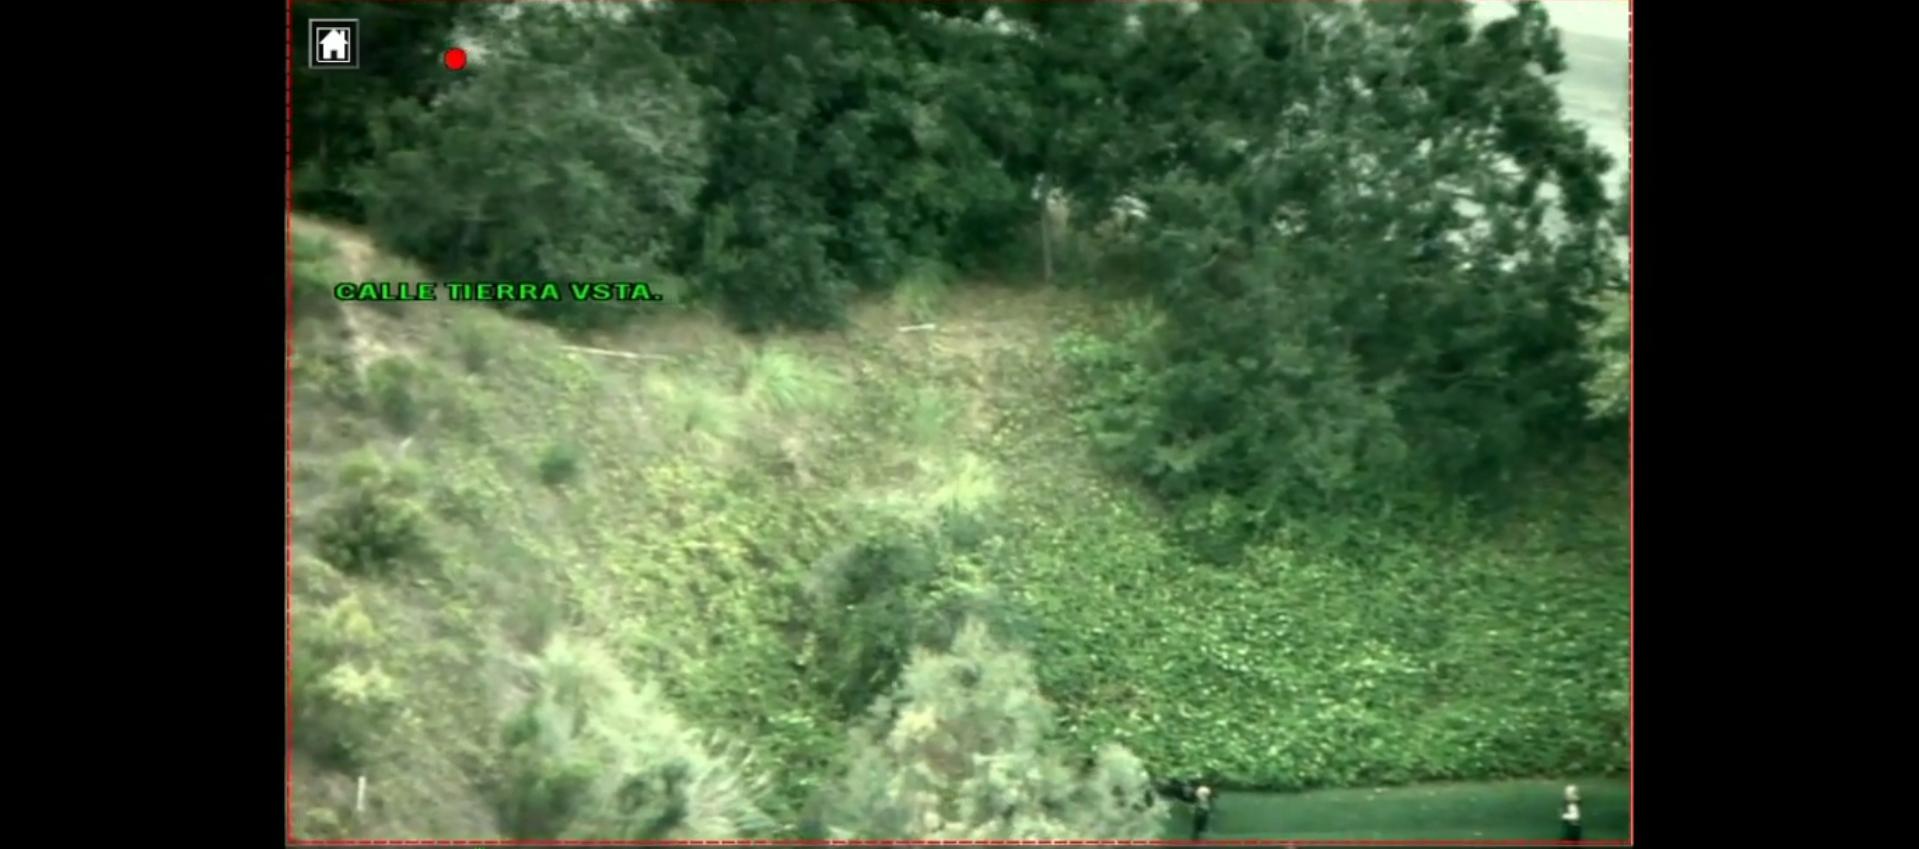 above: police target obscured by vegetation